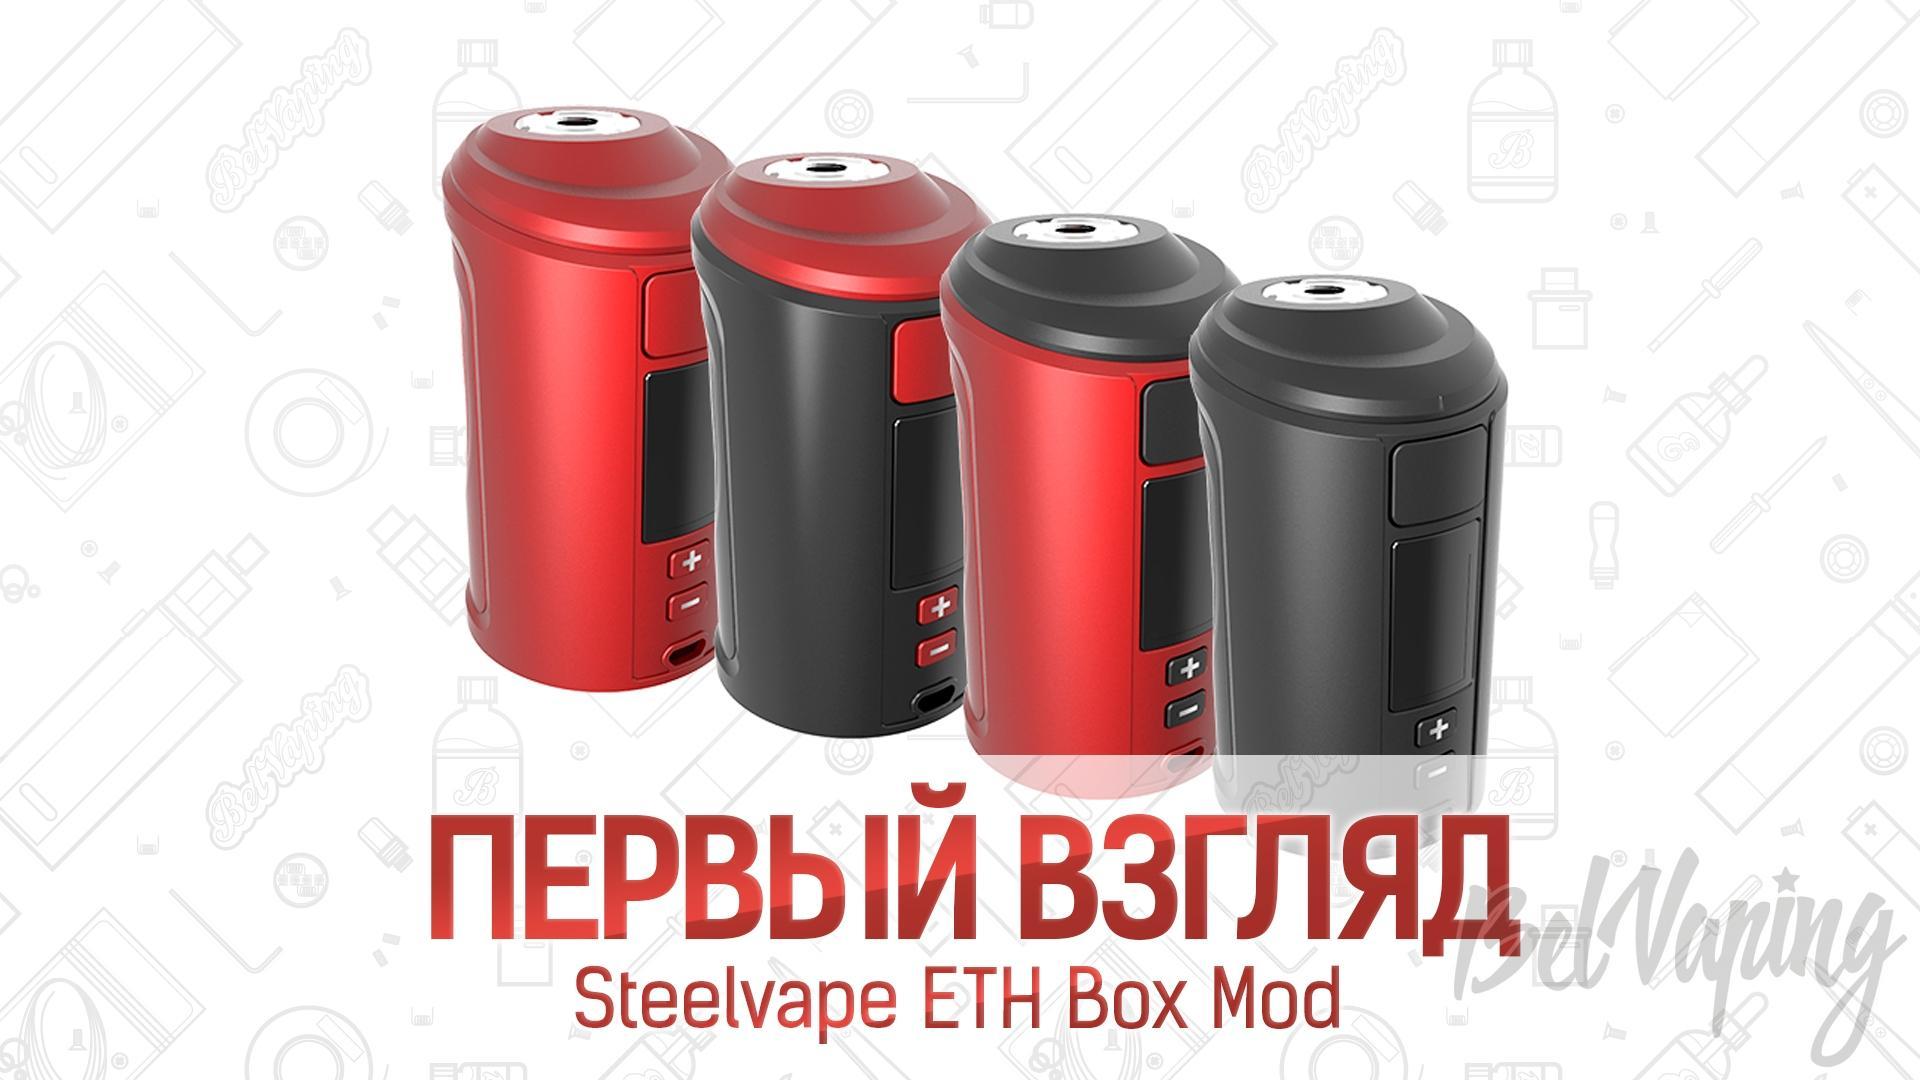 Steelvape ETH Box Mod. Первый взгляд